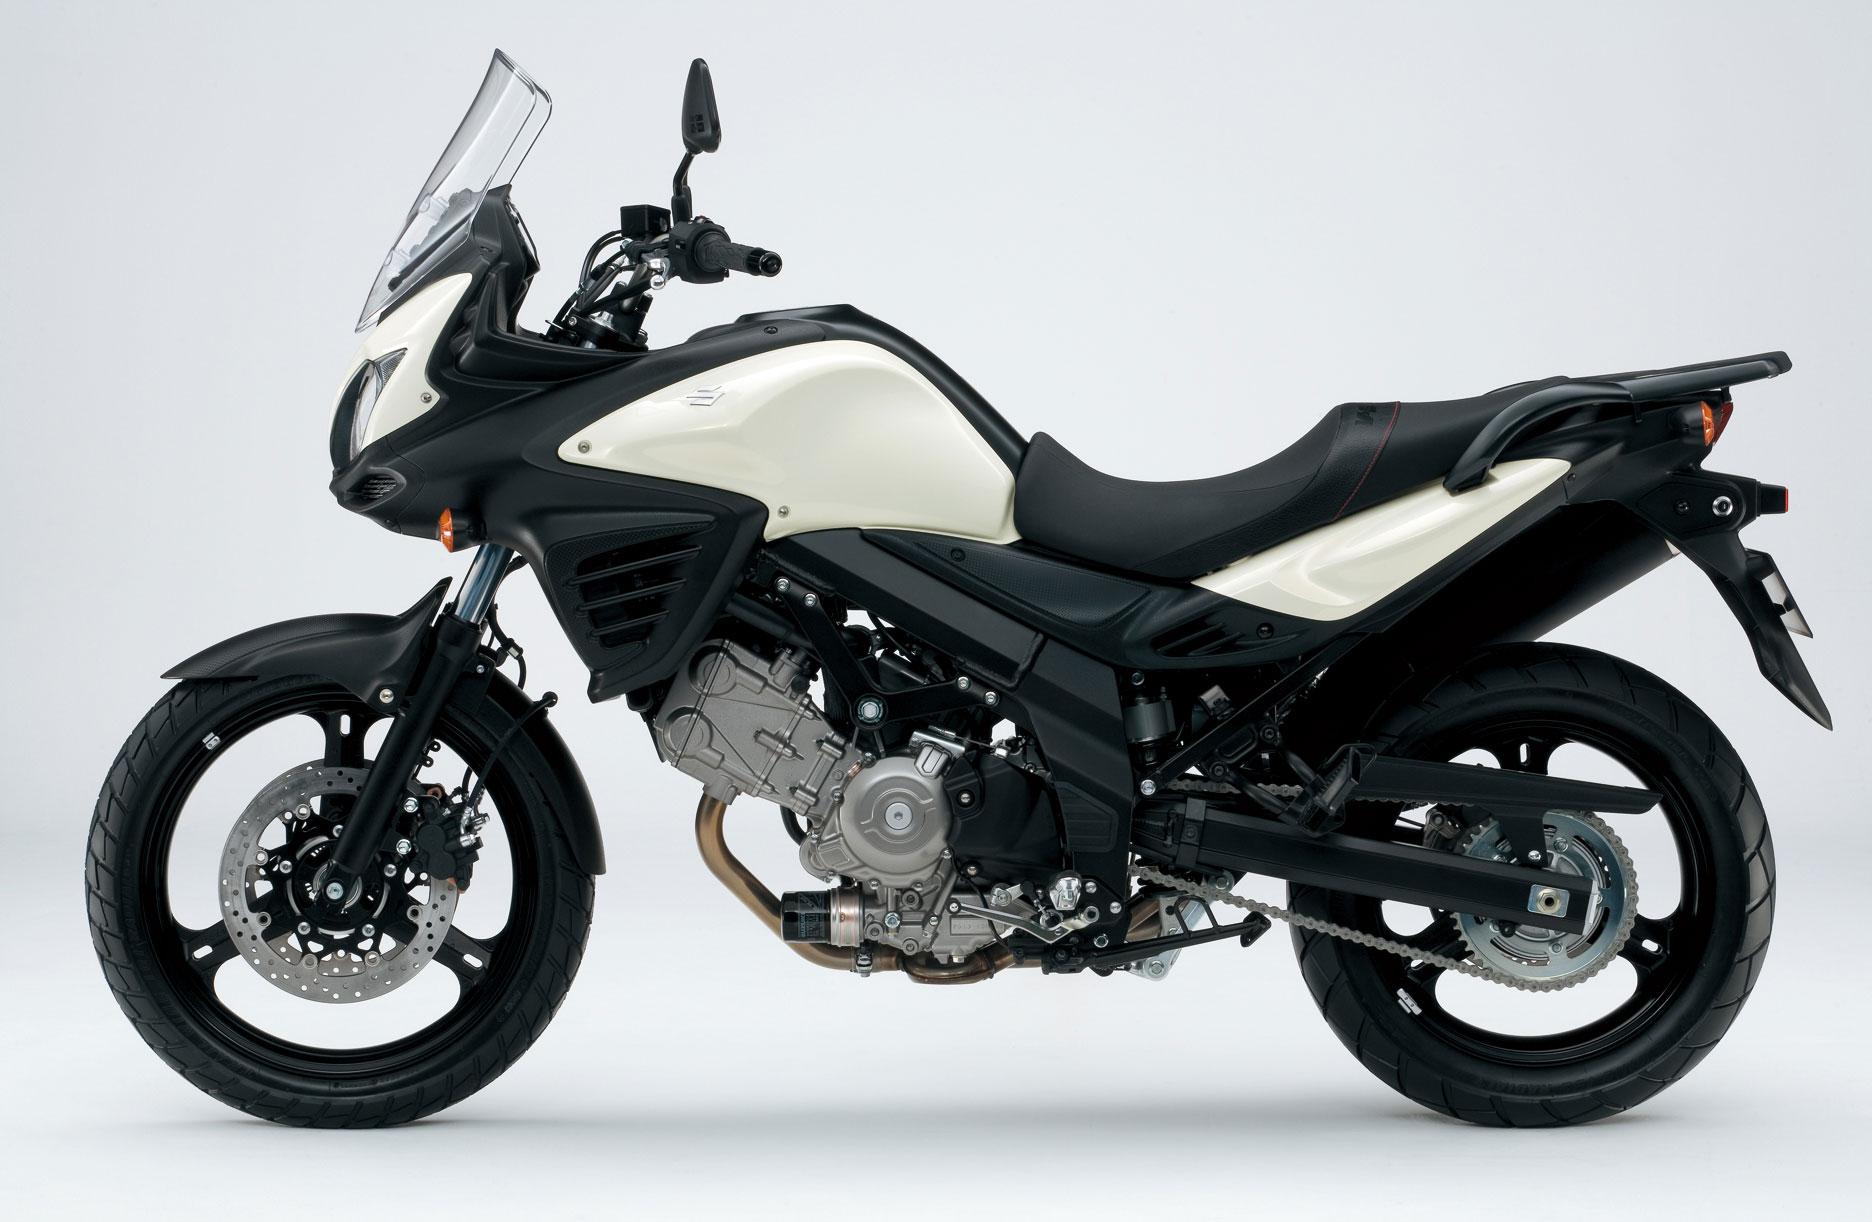 2013 Suzuki DL650 V-Strom Service Manual